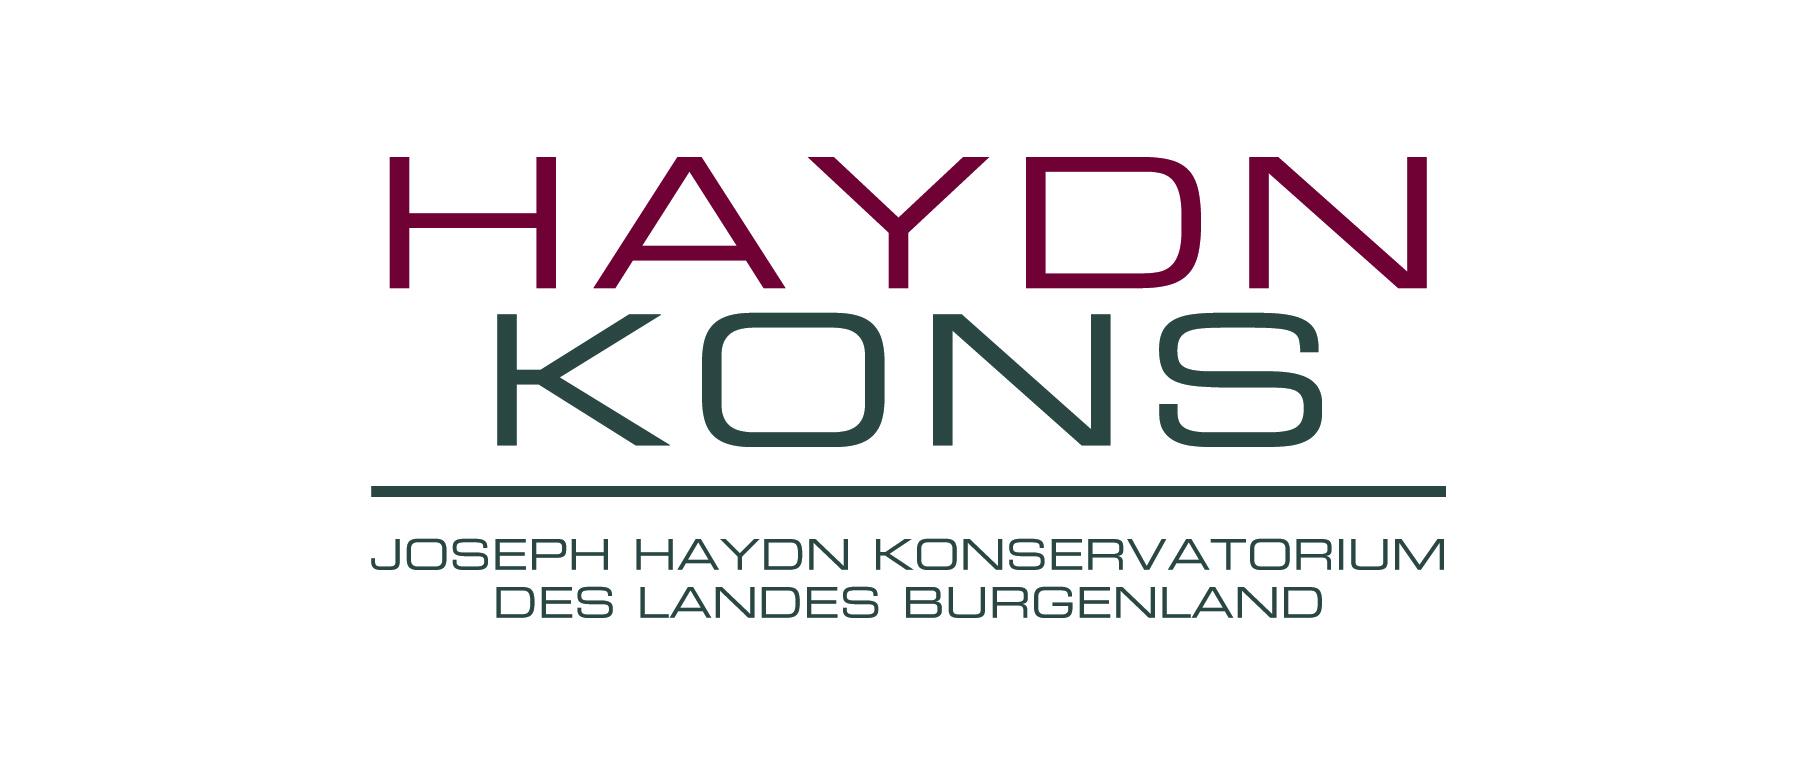 Joseph Haydn Konservatorium